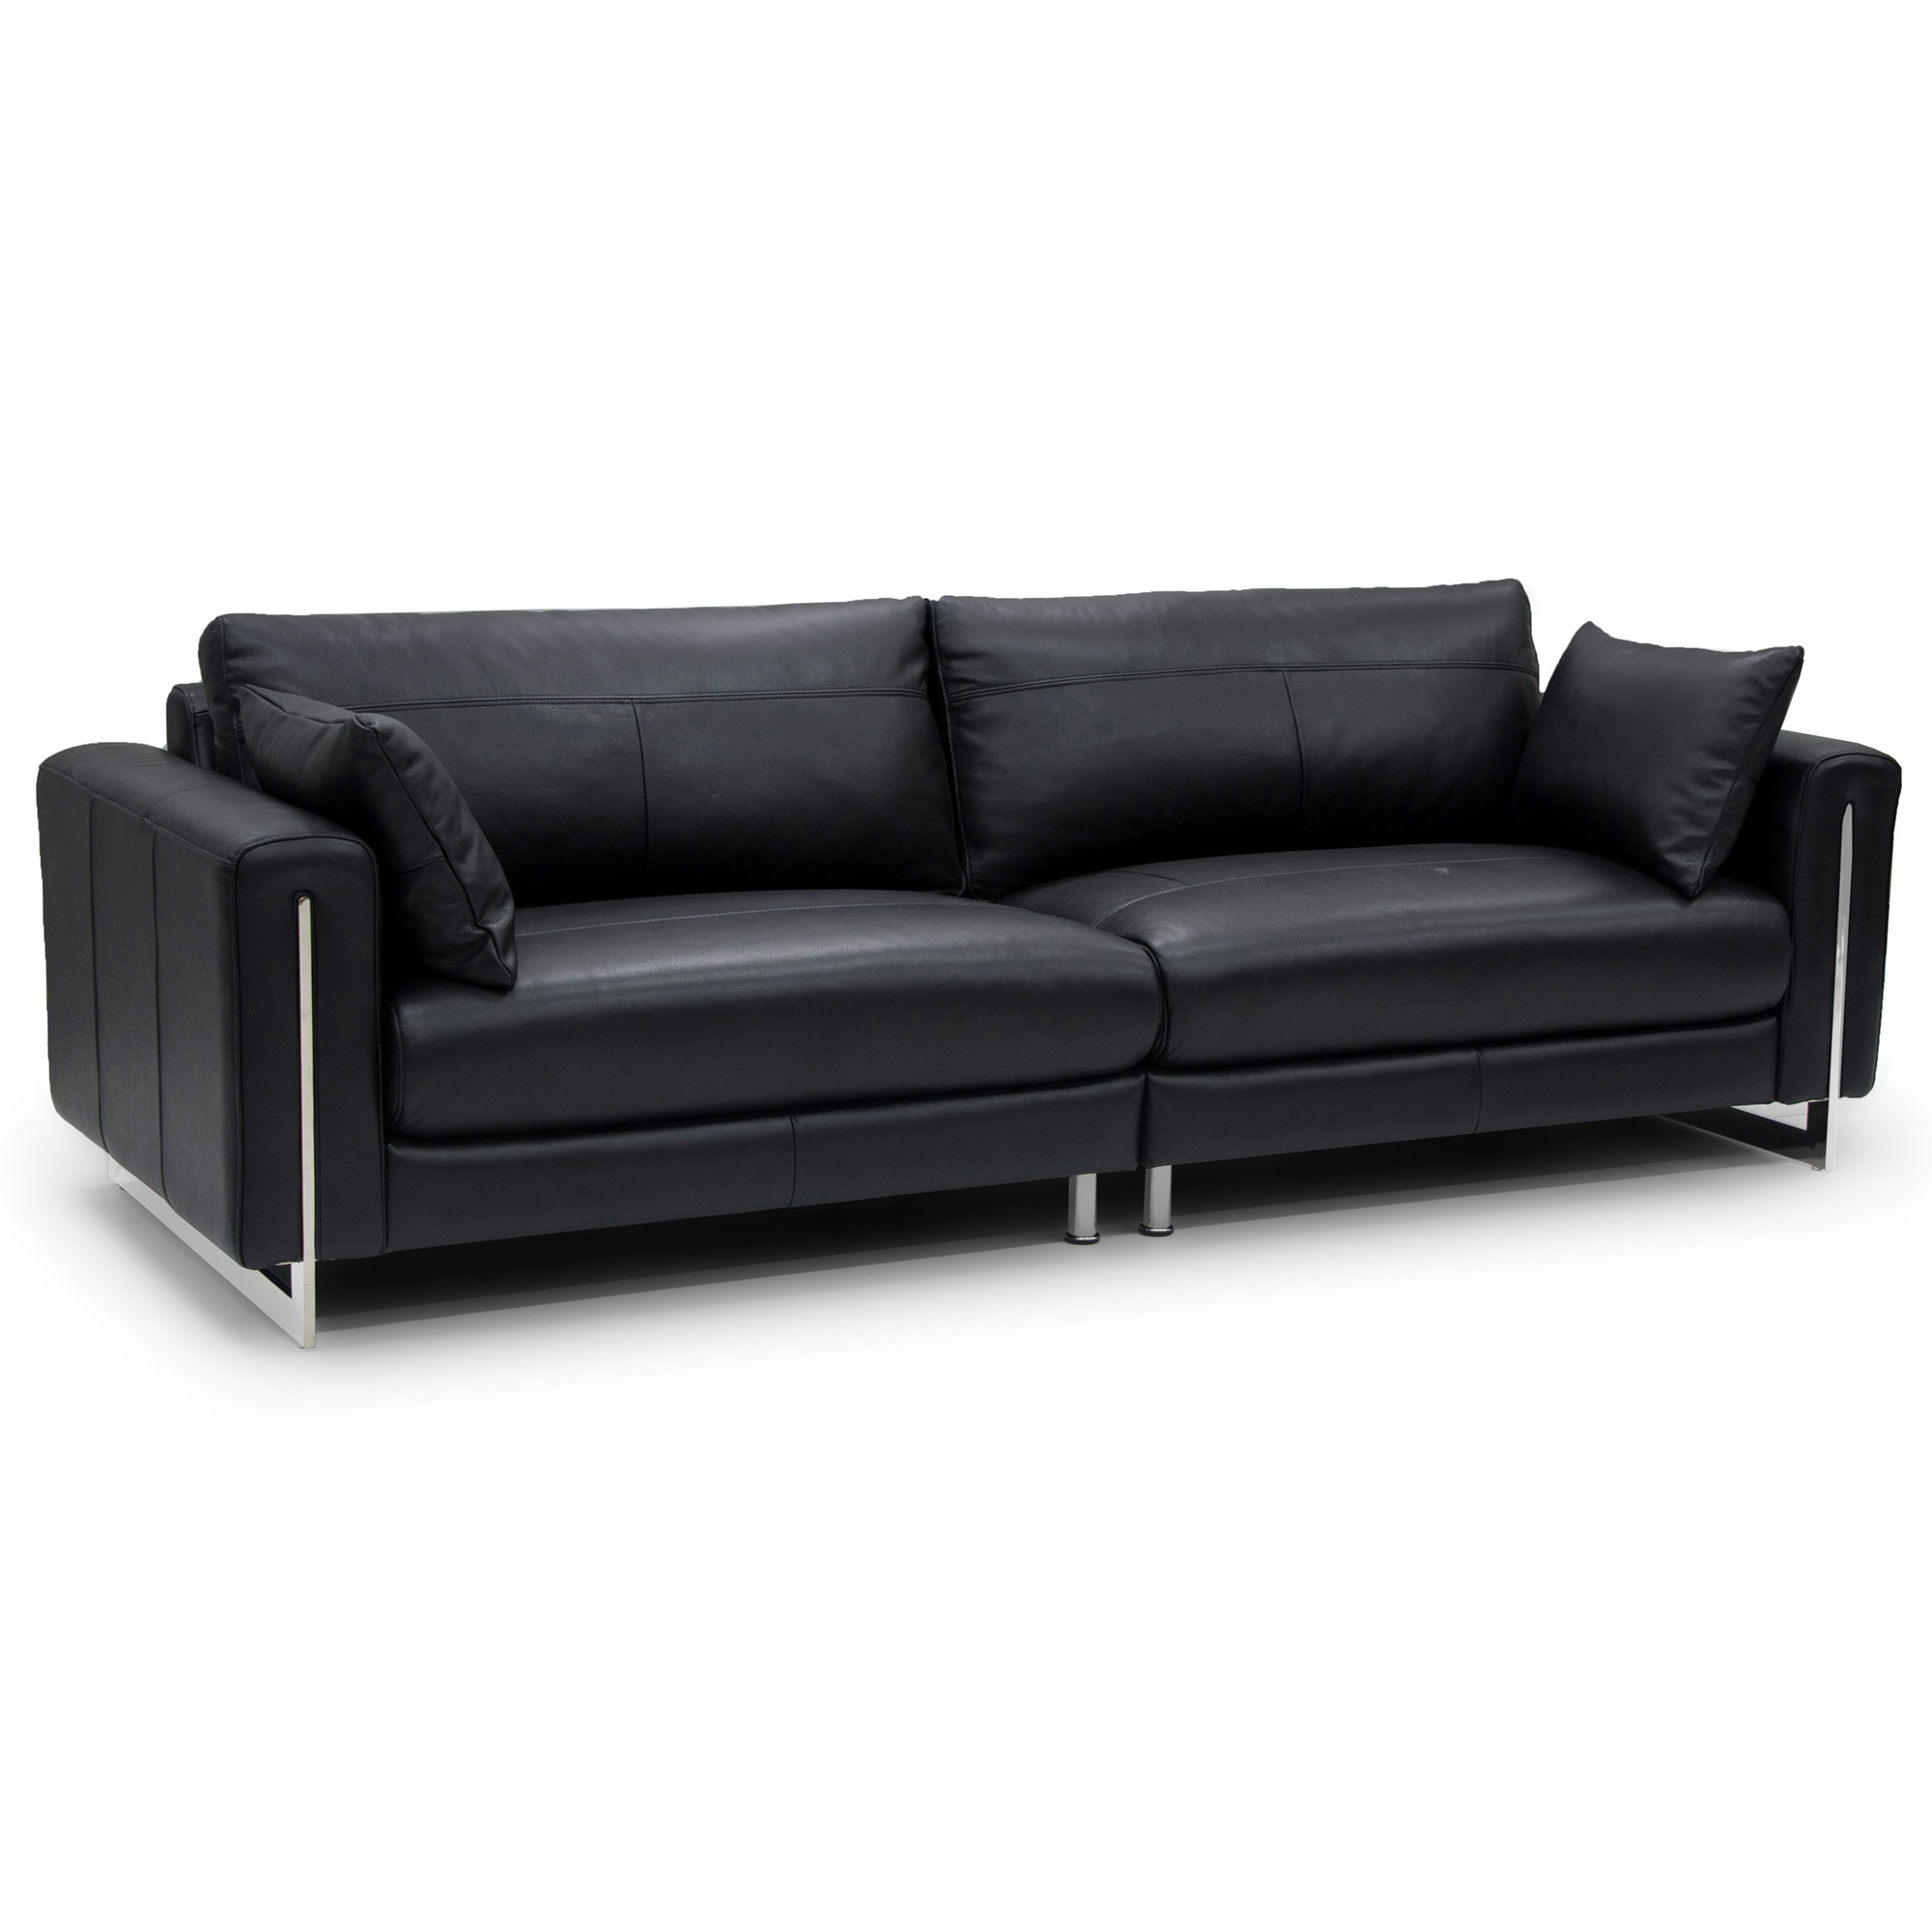 Conover Leather Sofa, 4 Seater